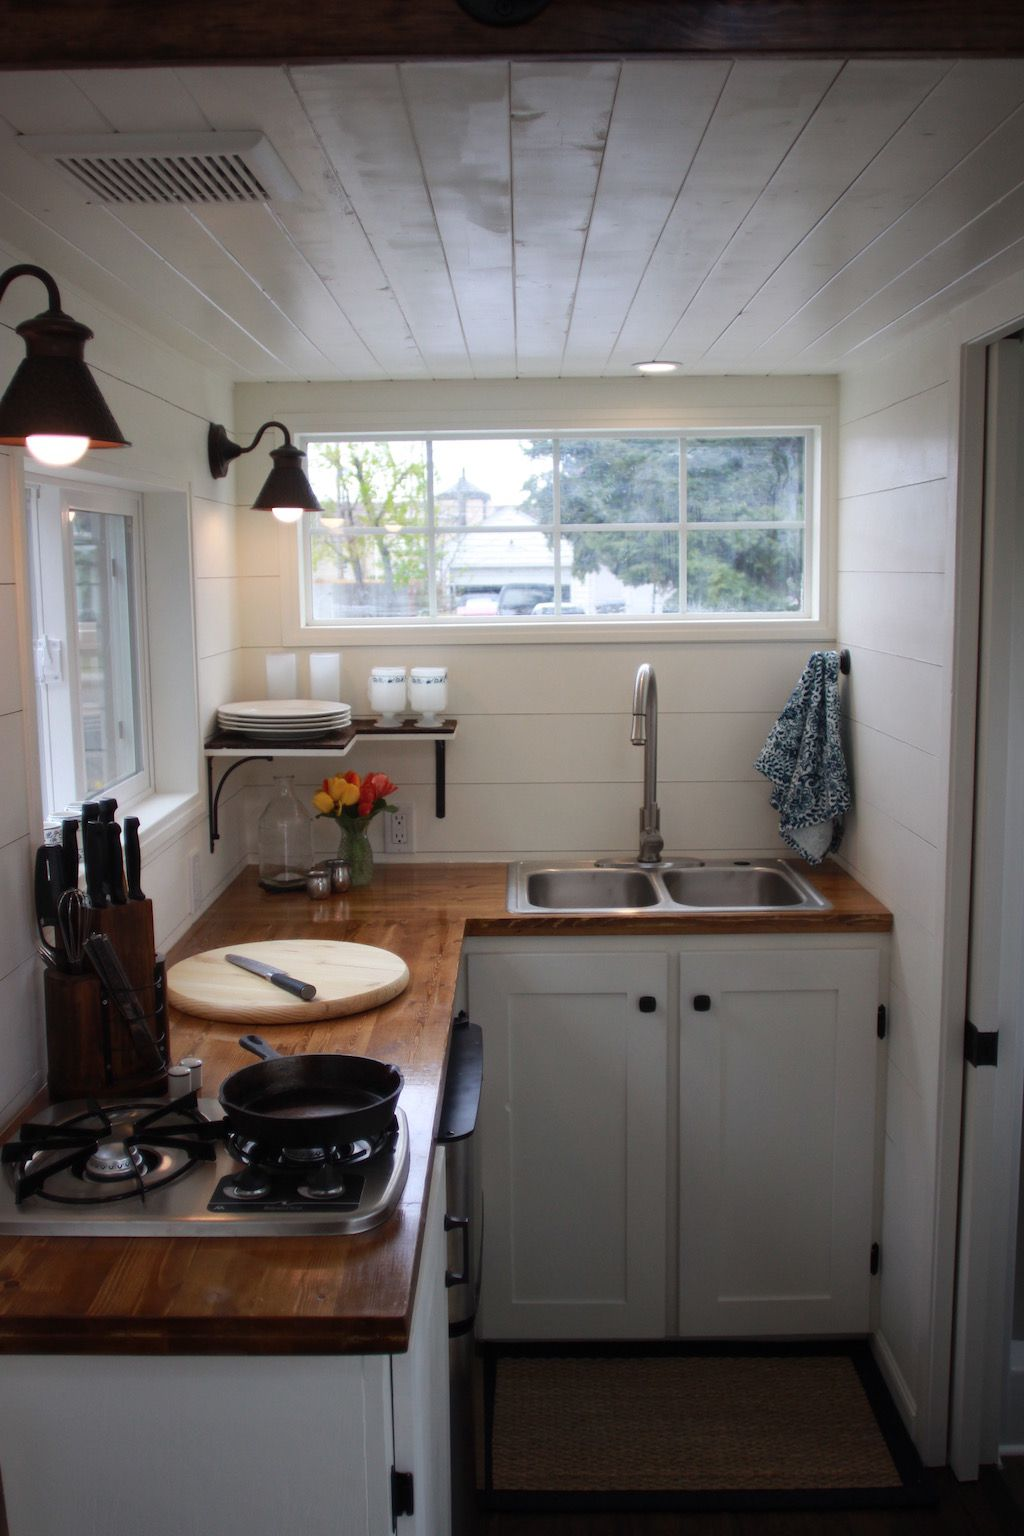 thompson tiny house kitchen remodel on kitchen remodel kitchen designs id=39050